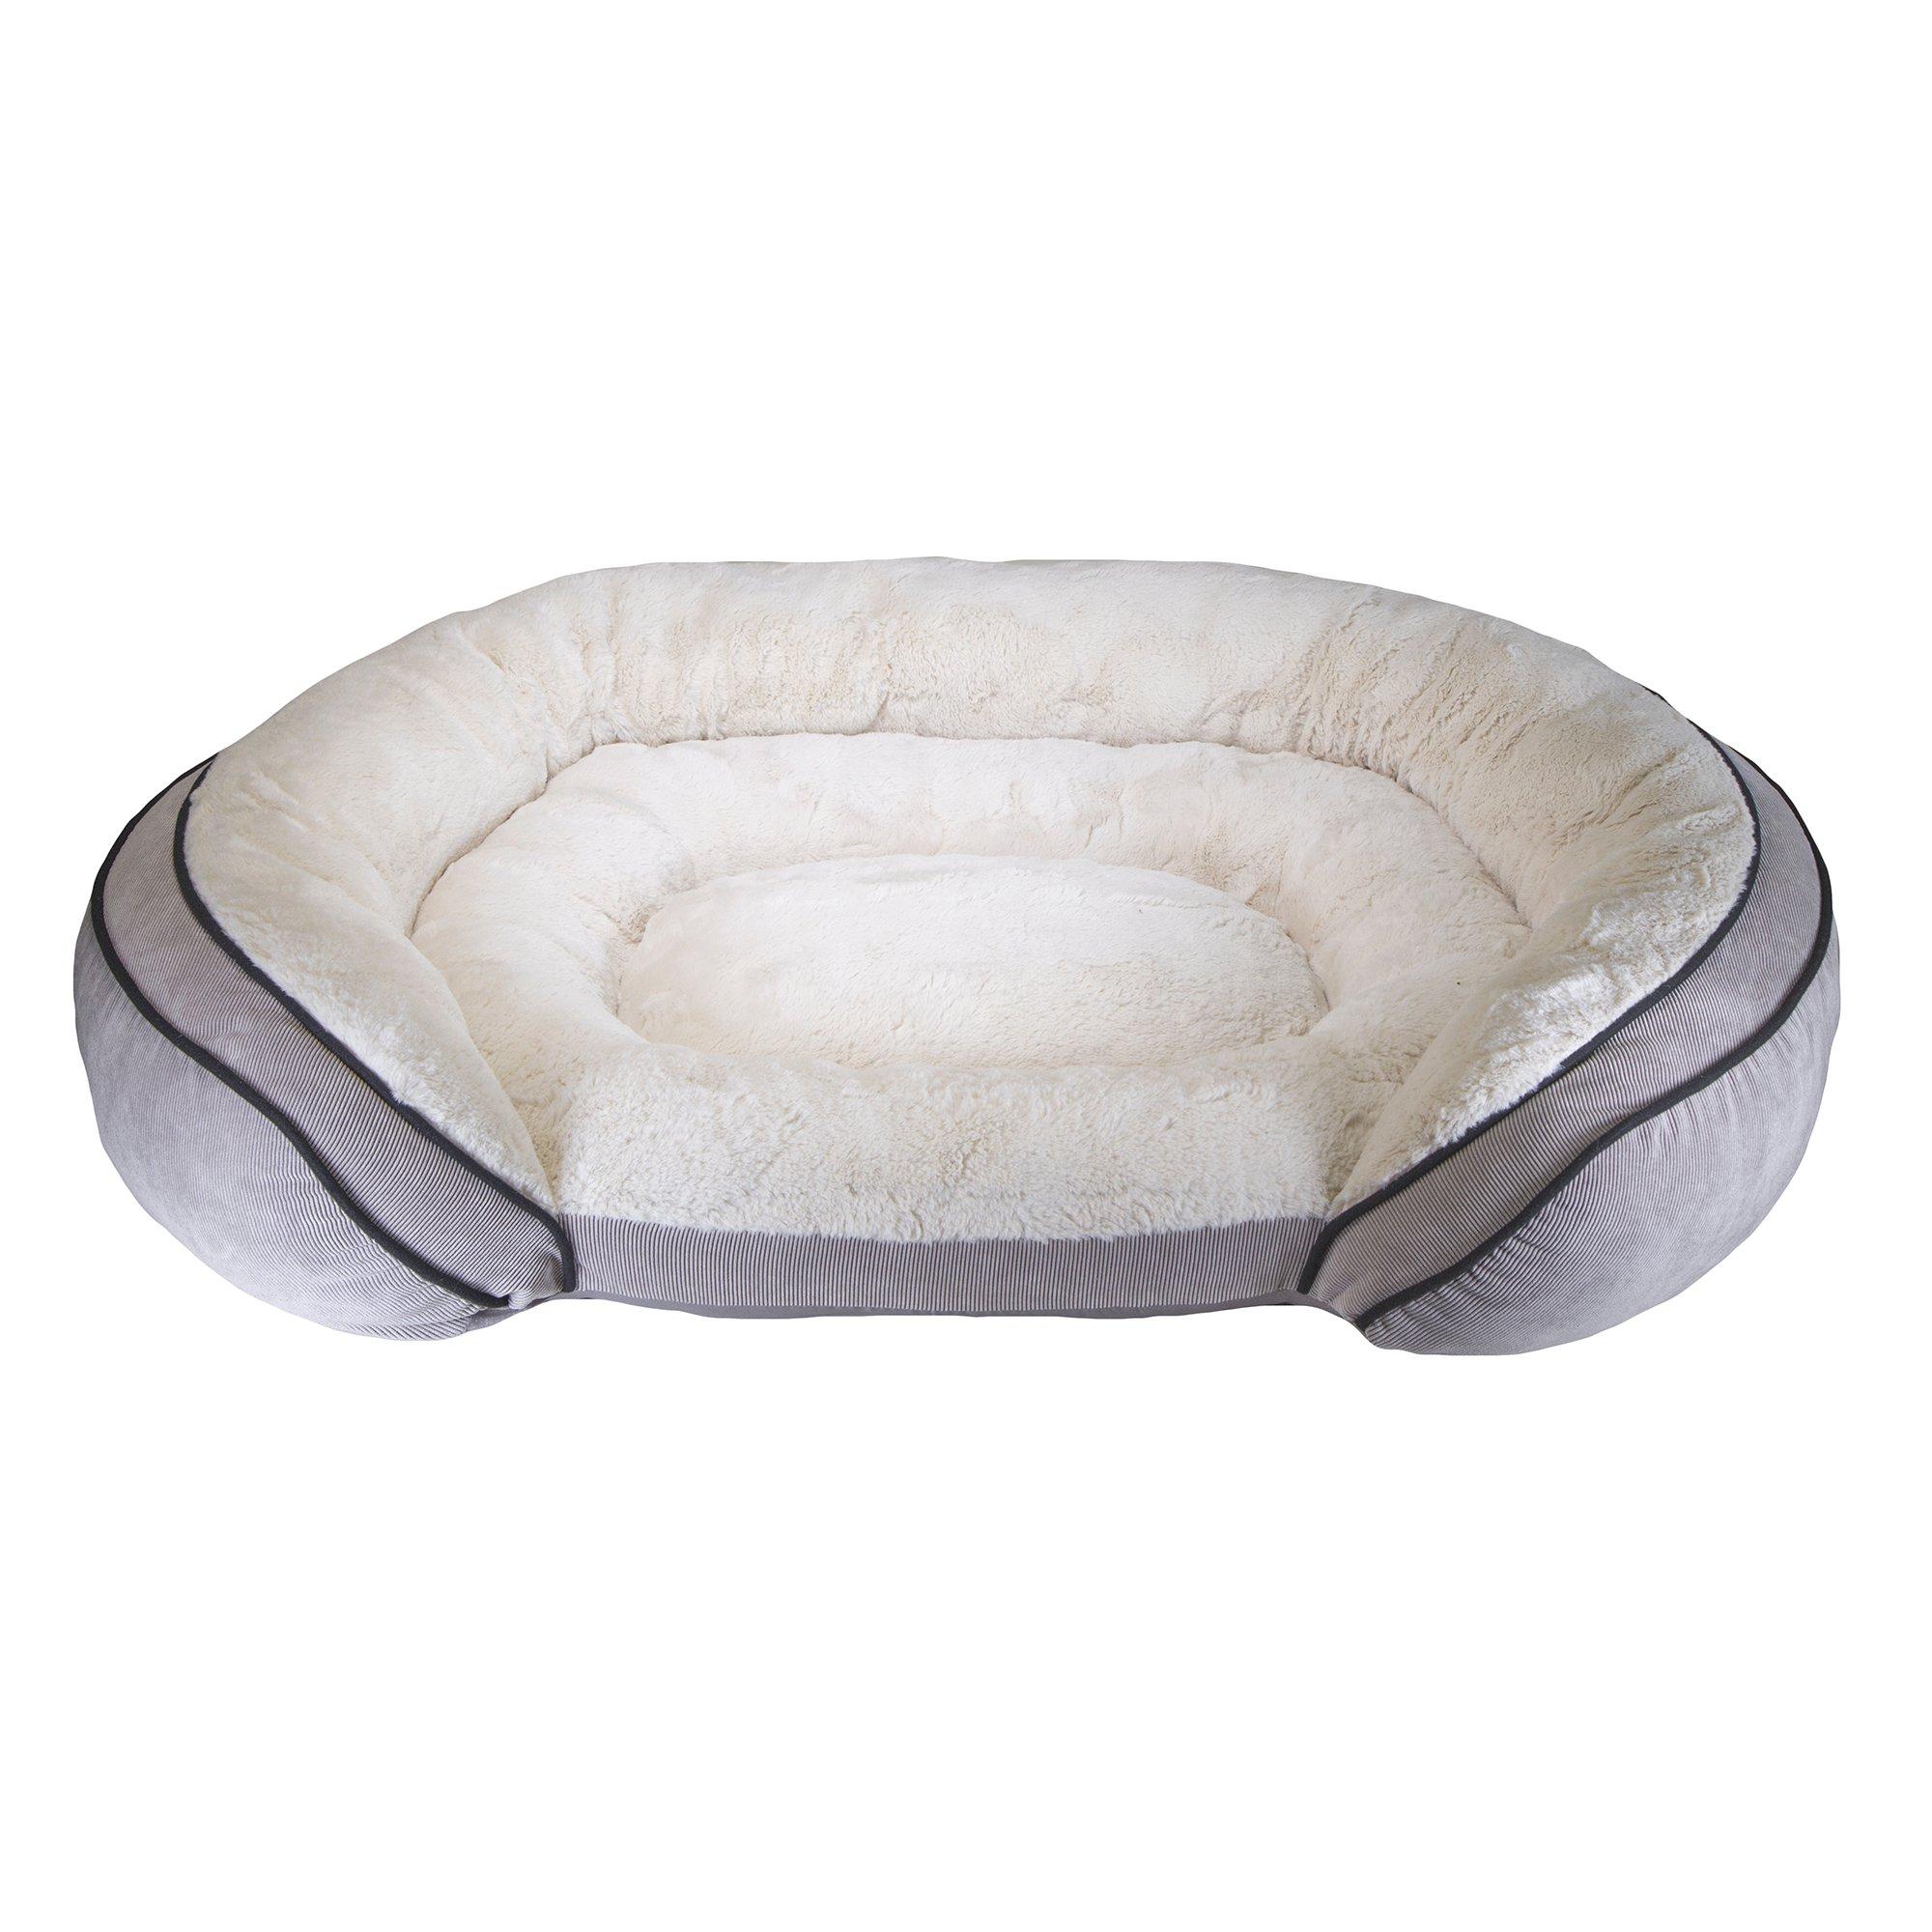 Dog Beds On Sale